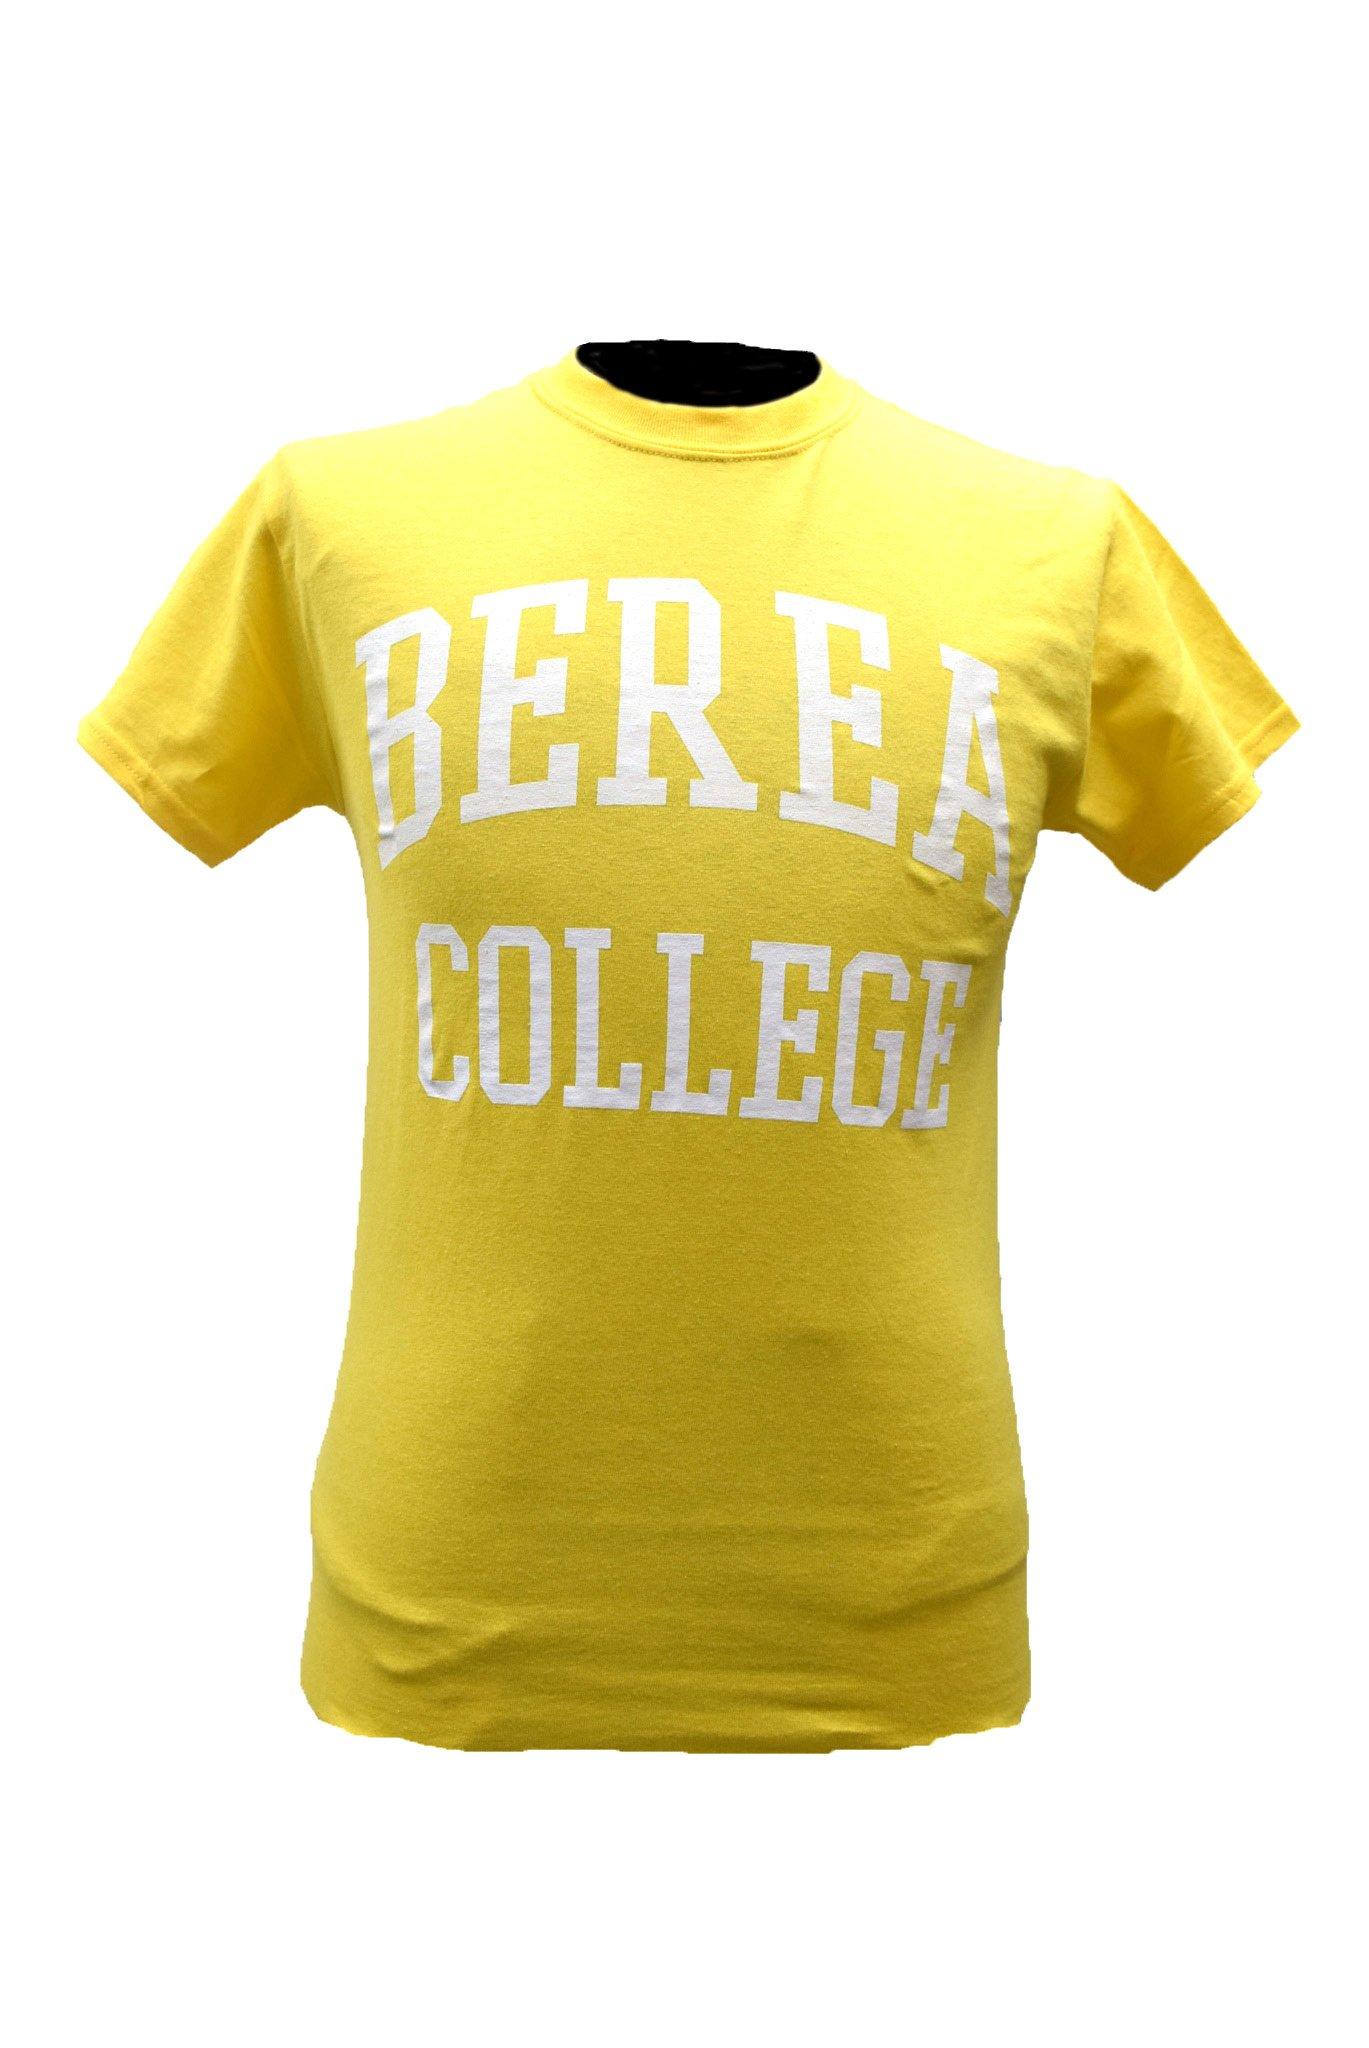 Berea College Classic T- Shirt-4